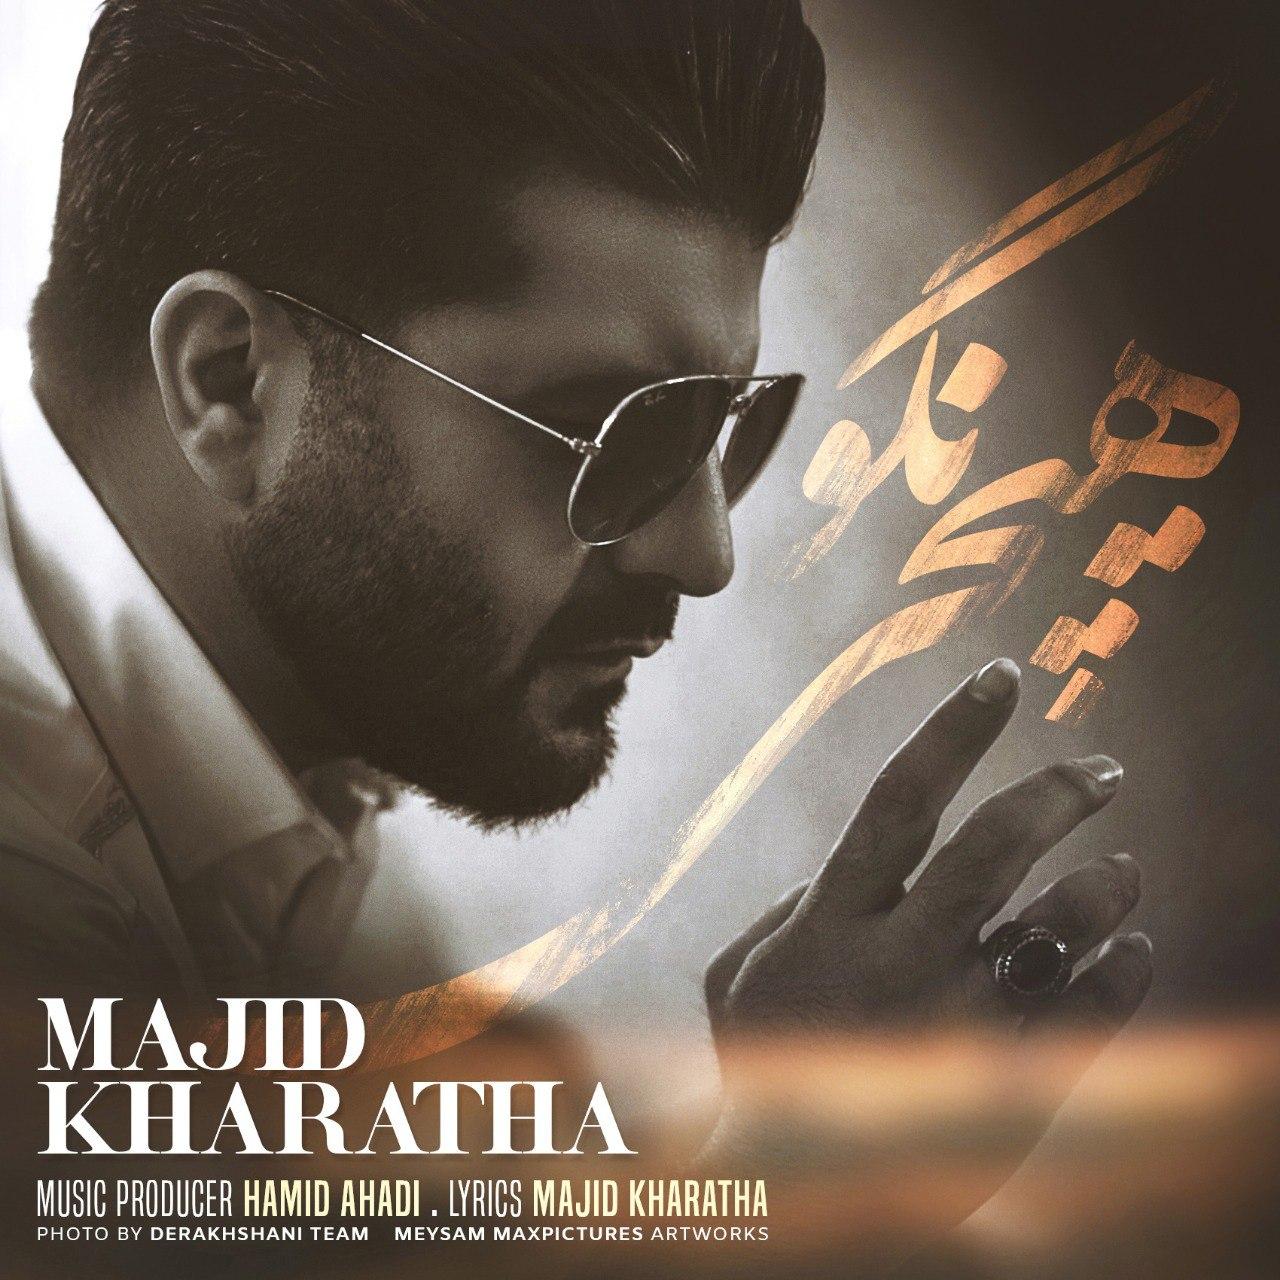 193 MajidKharatha HichiNagoo آهنگ هیچی نگو از مجید خراطها